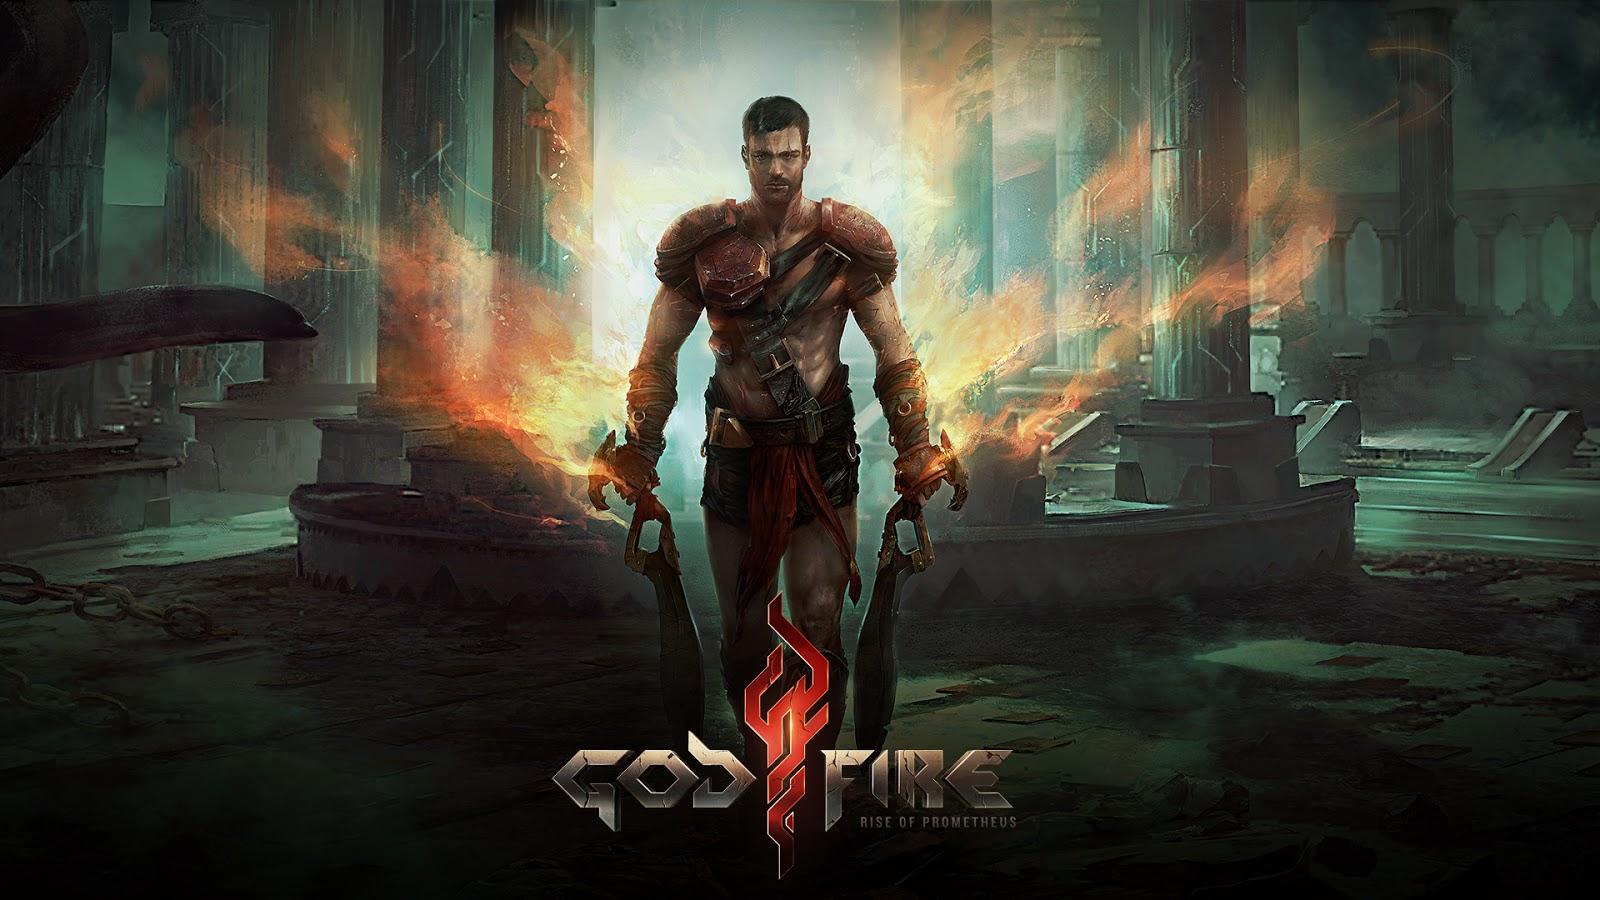 Godfire Rise of Prometheus wallpaper - godfire rise of prometheus wallpapers